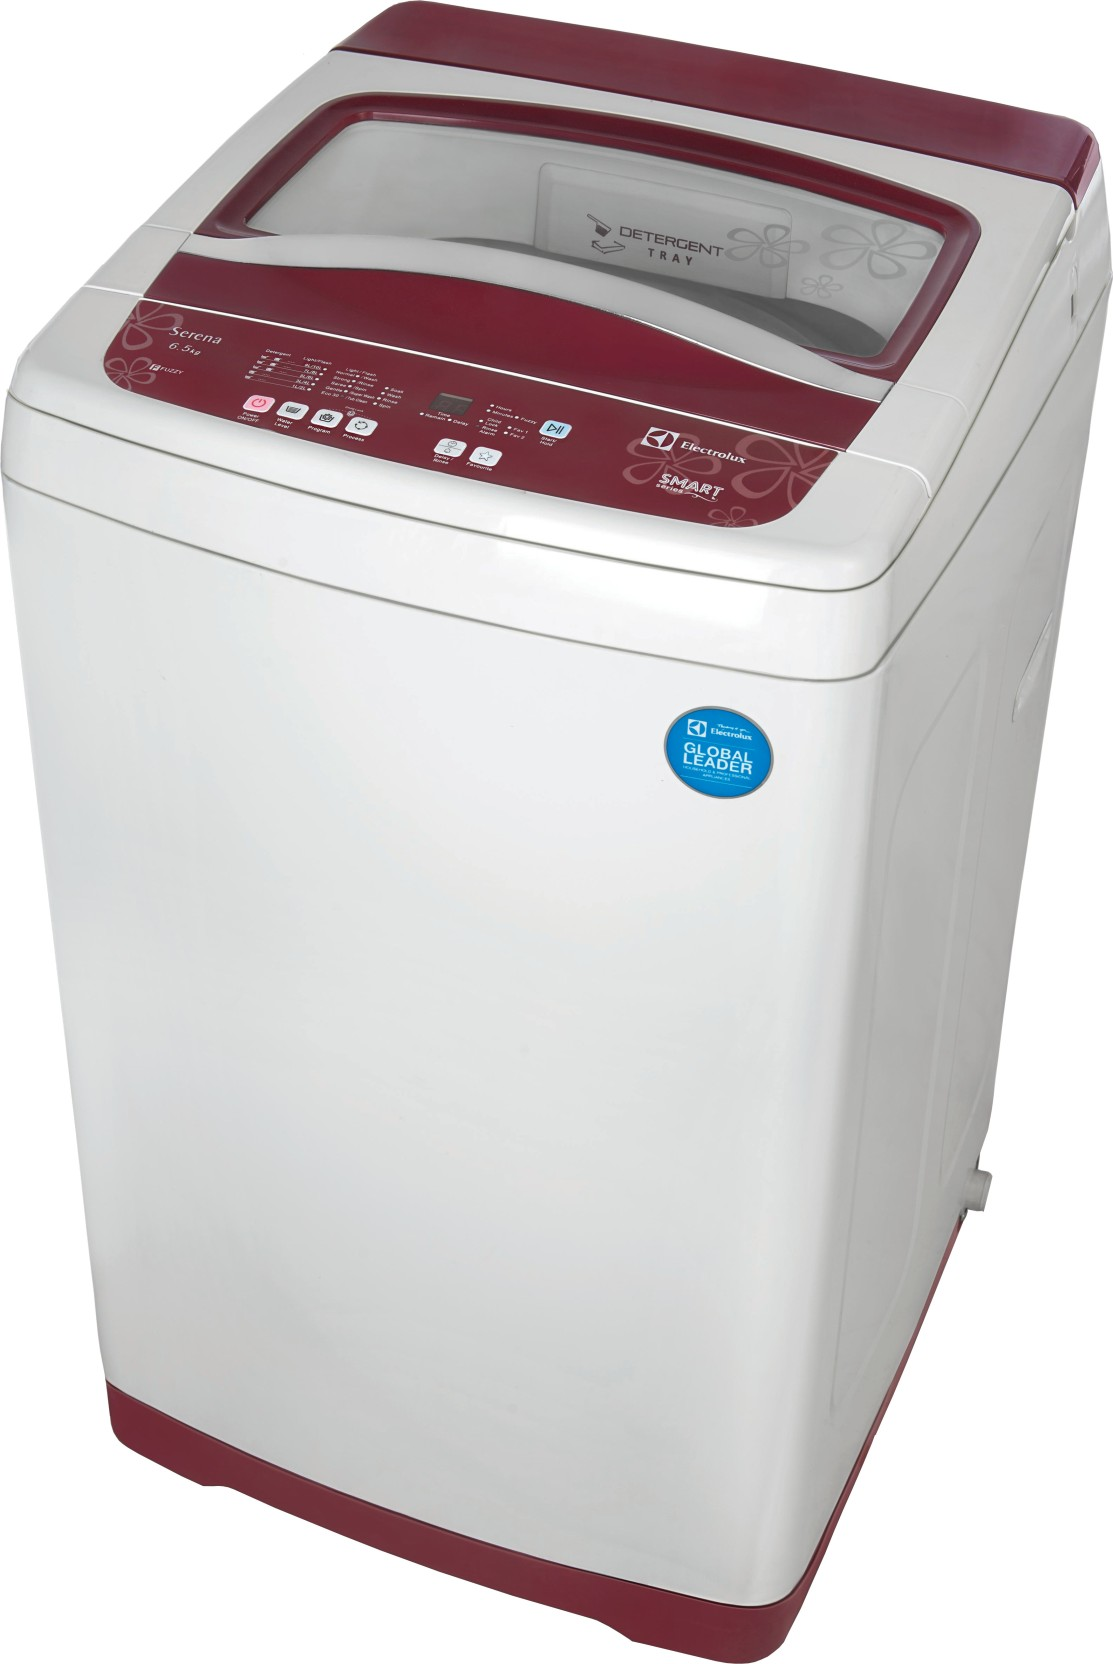 Best Buy Washing Machine In India